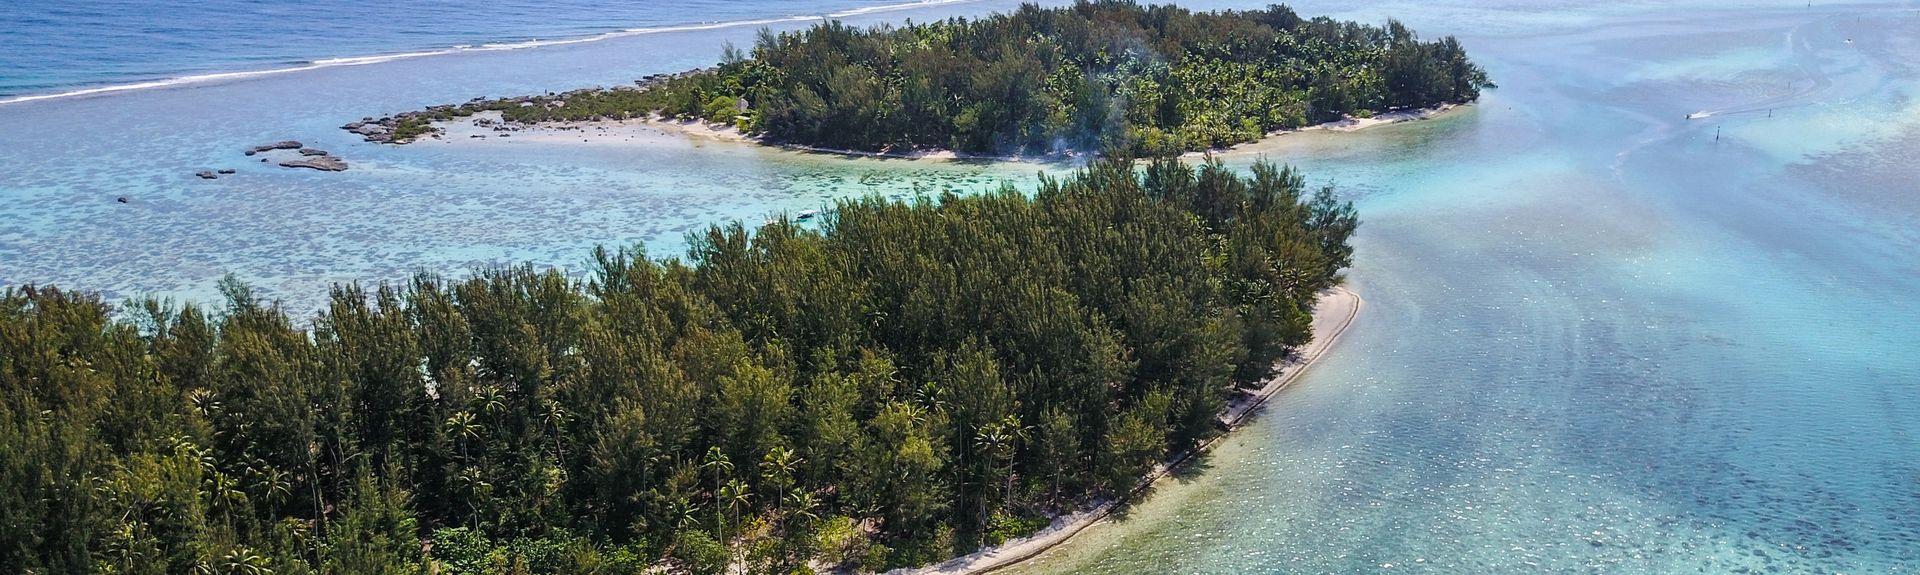 Ha'apiti, French Polynesia